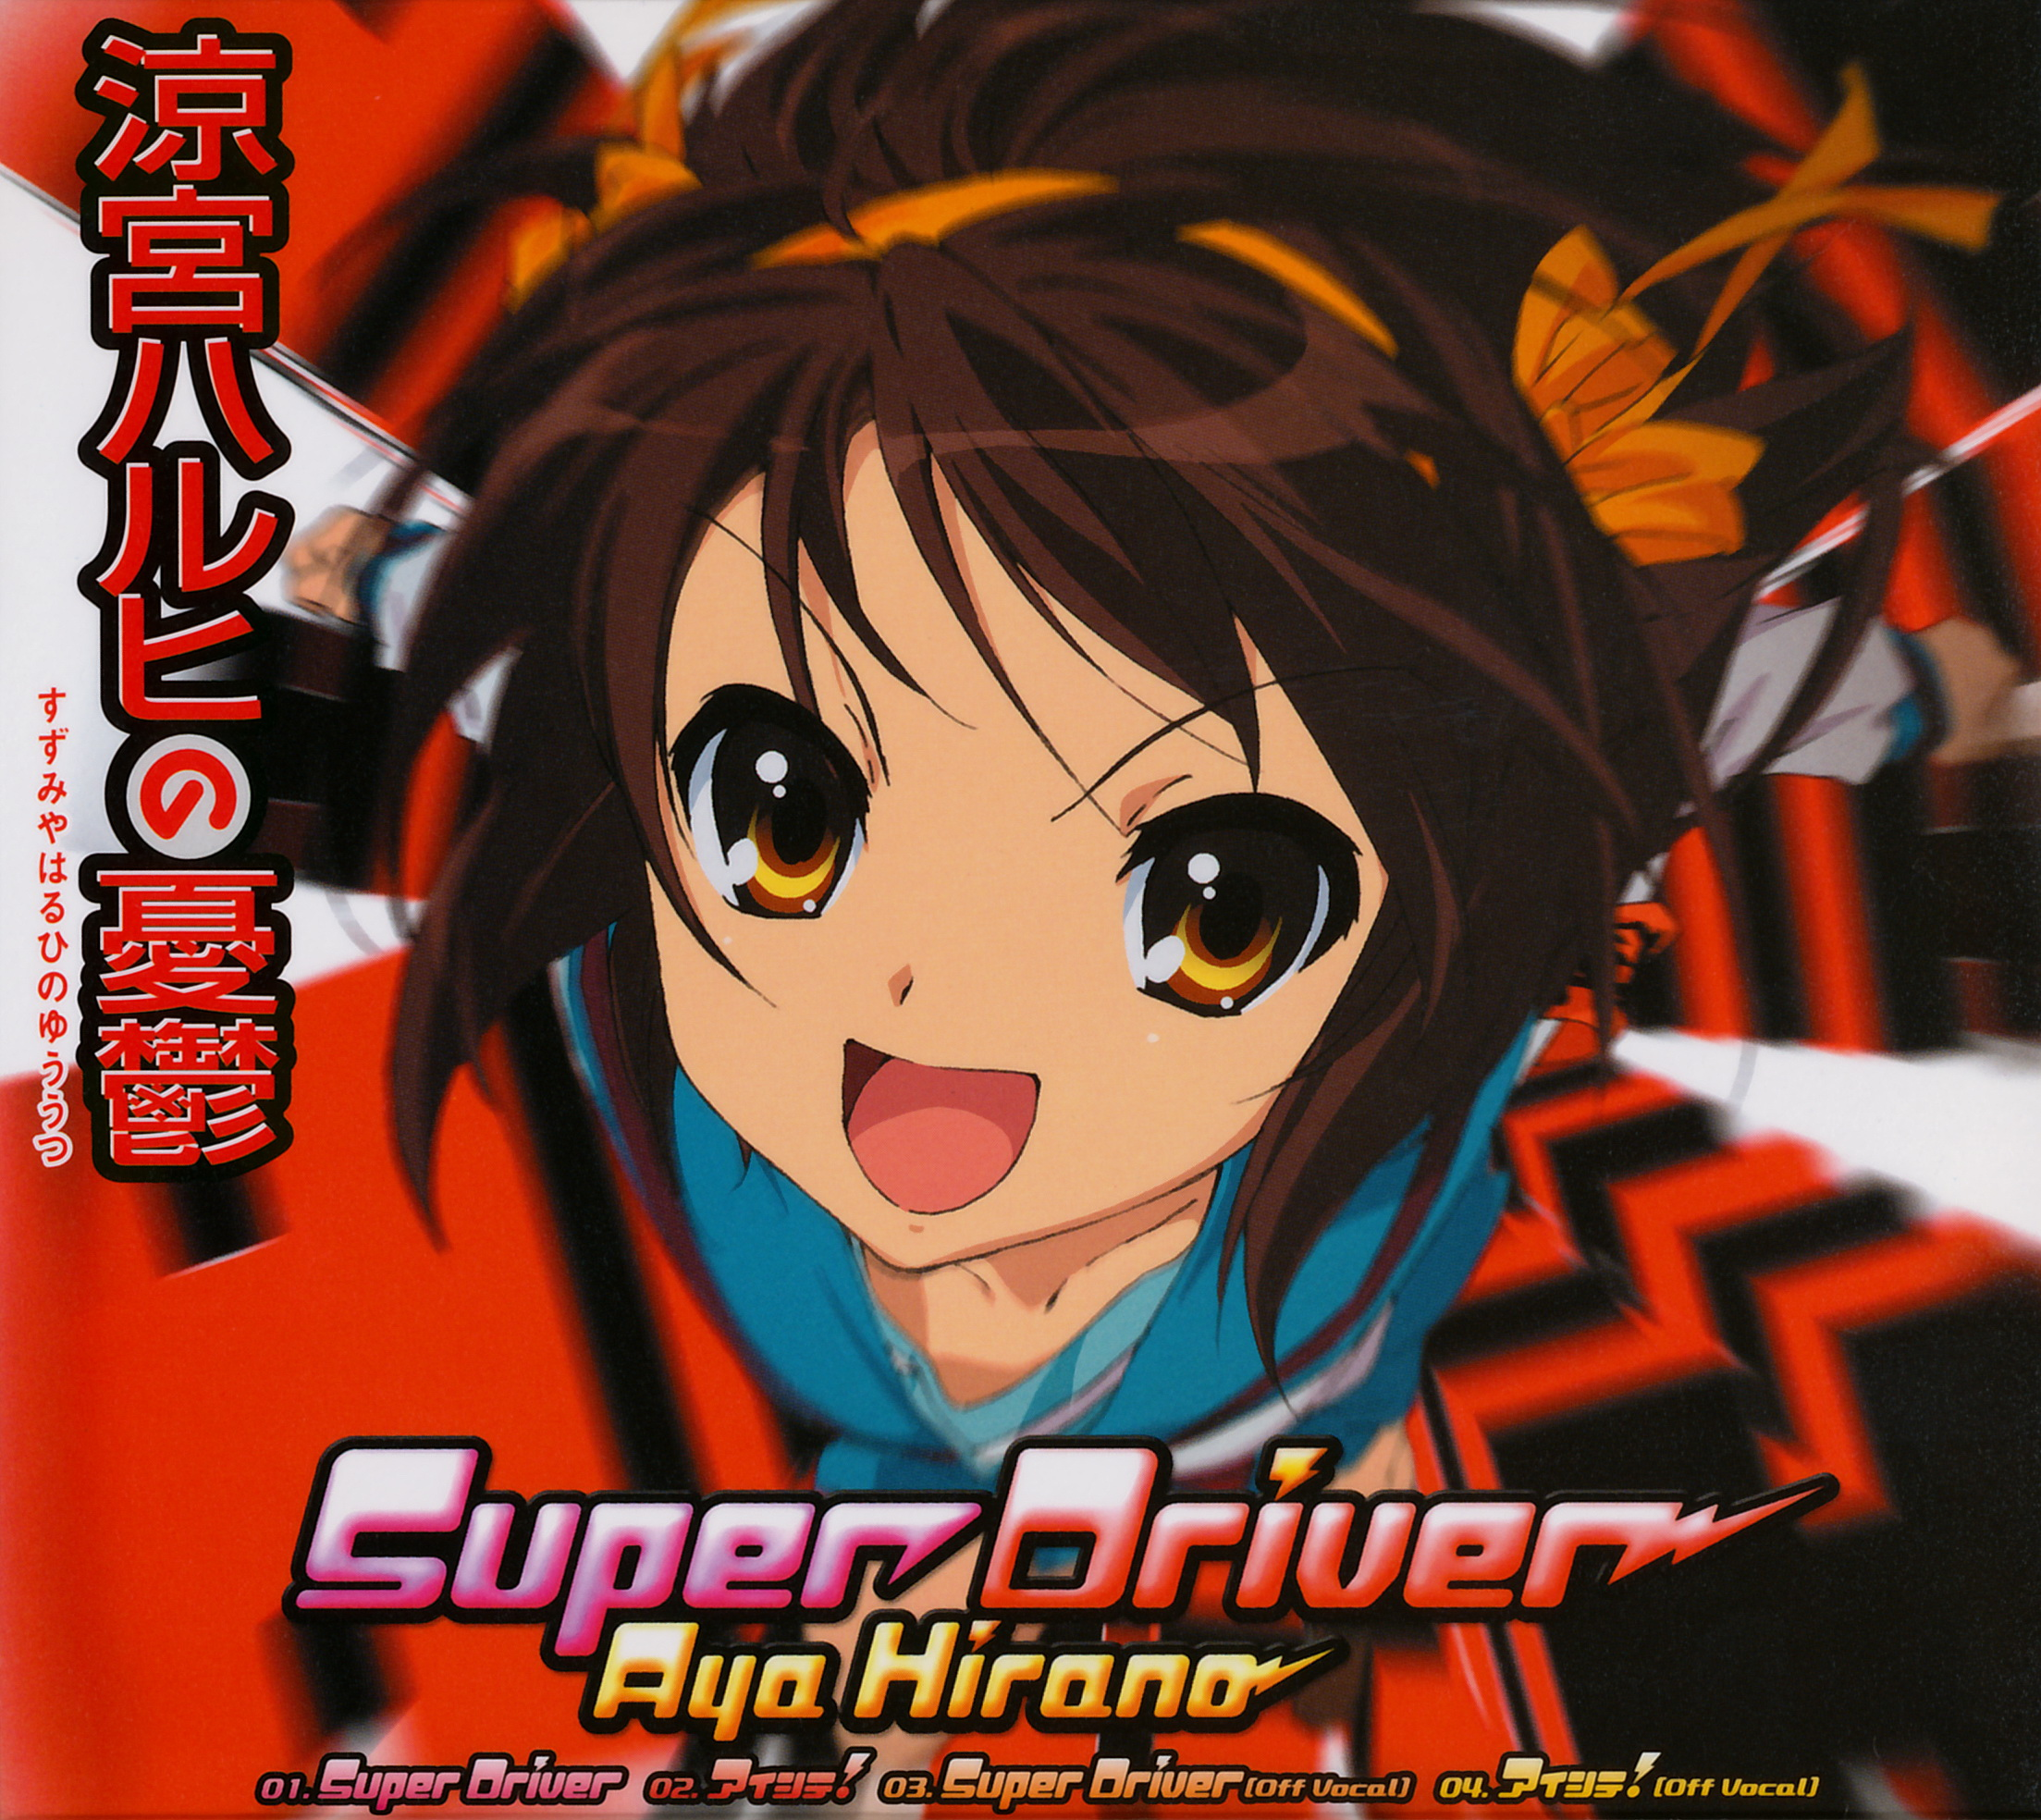 HARUHI SUZUMIYA SUPER DRIVER DOWNLOAD FREE